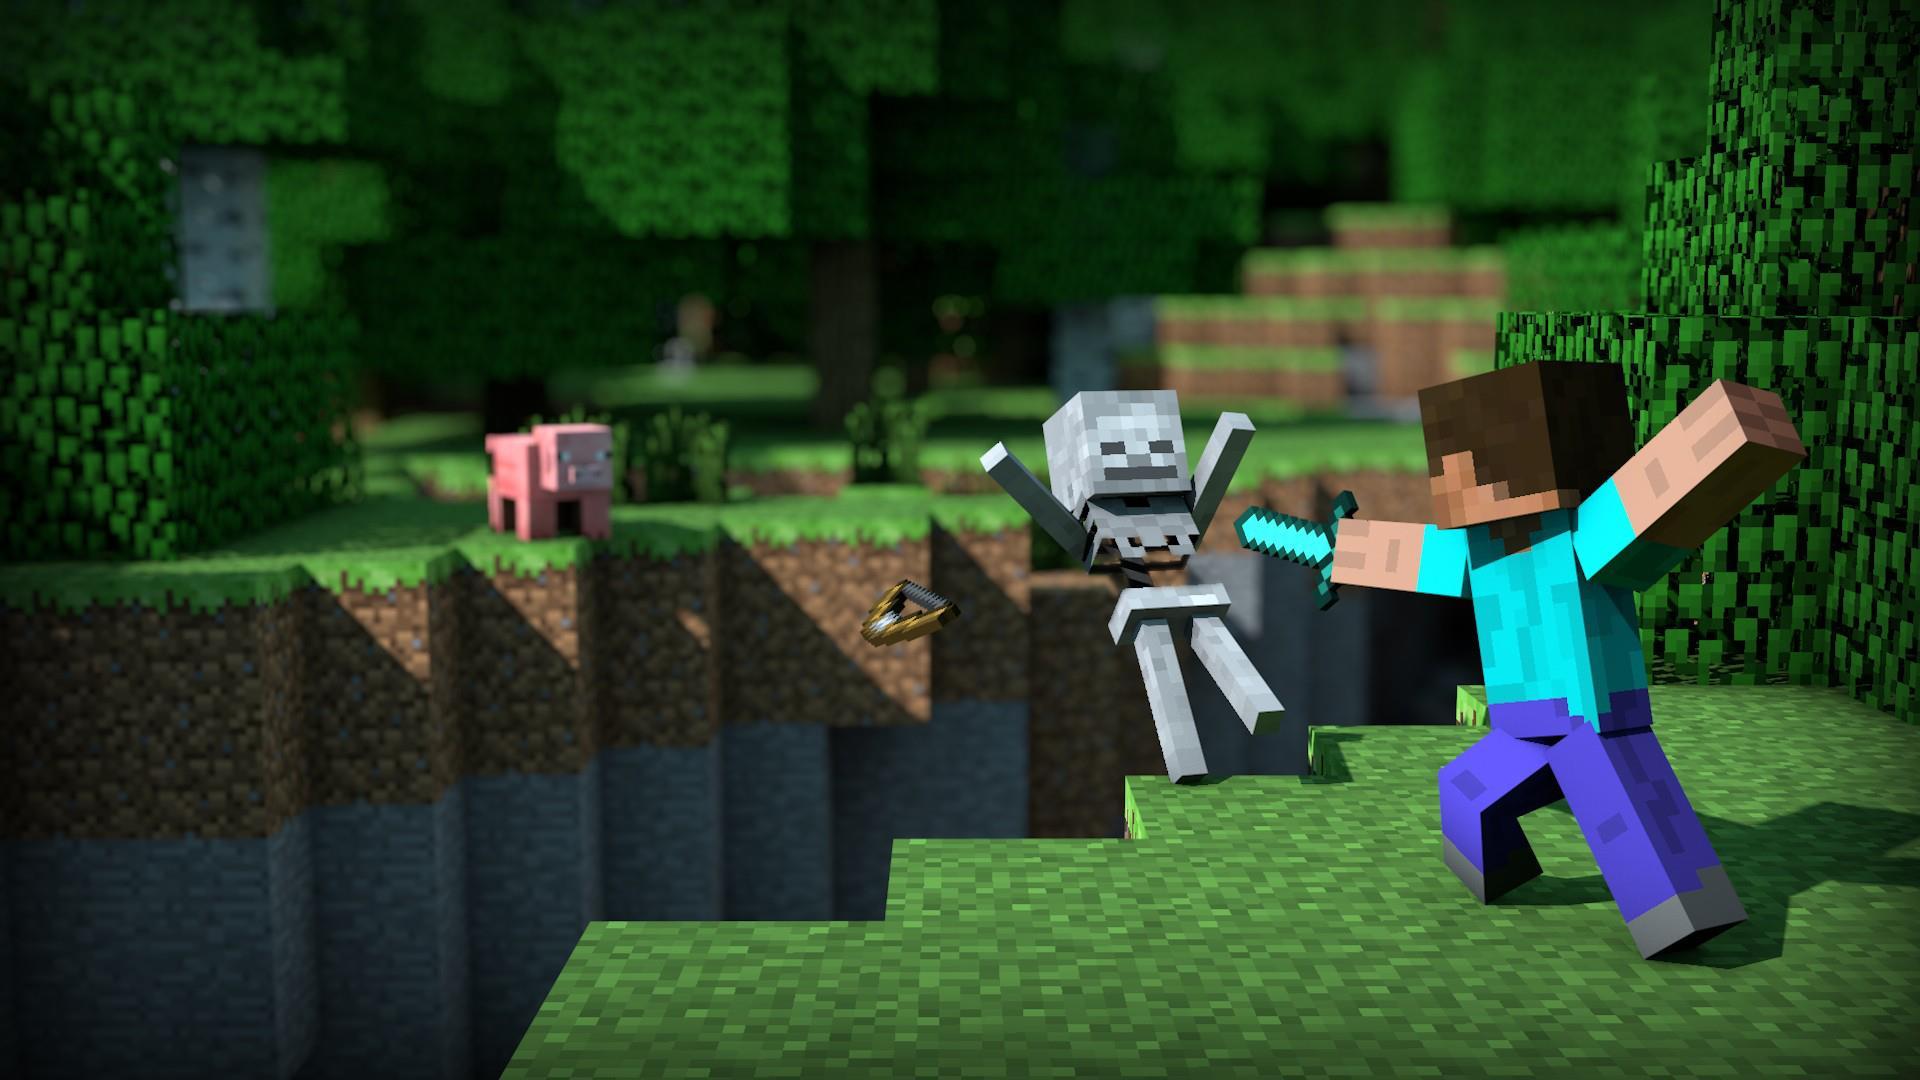 Minecraft-Background-Sdeer-wallpaper-wpc5807191